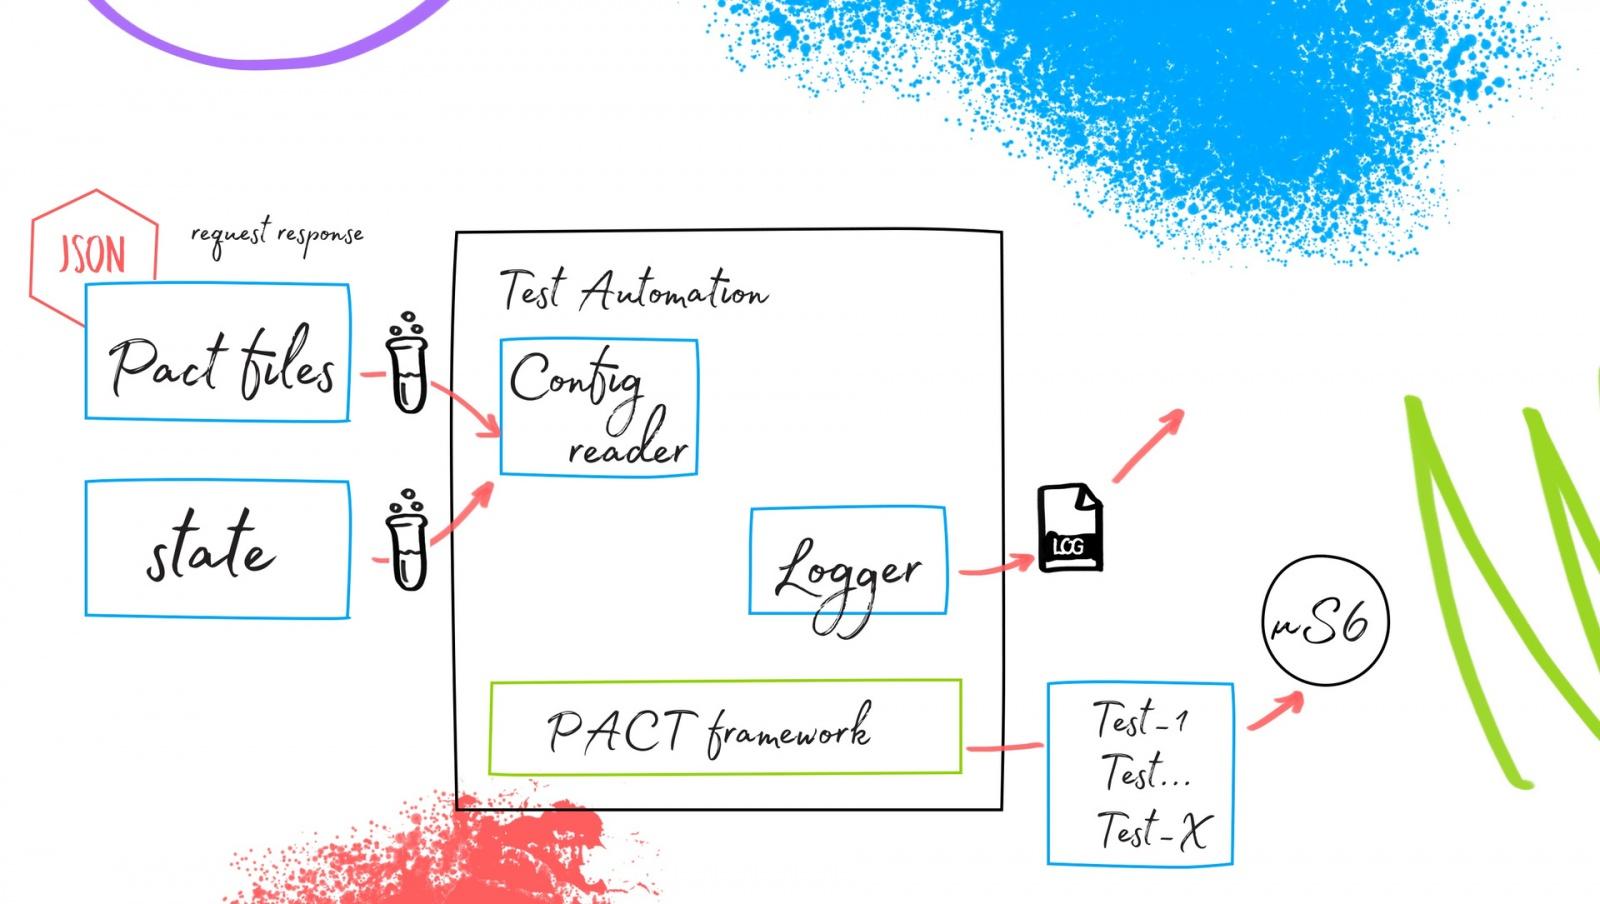 Ядро автоматизации тестирования в микросервисной архитектуре - 5